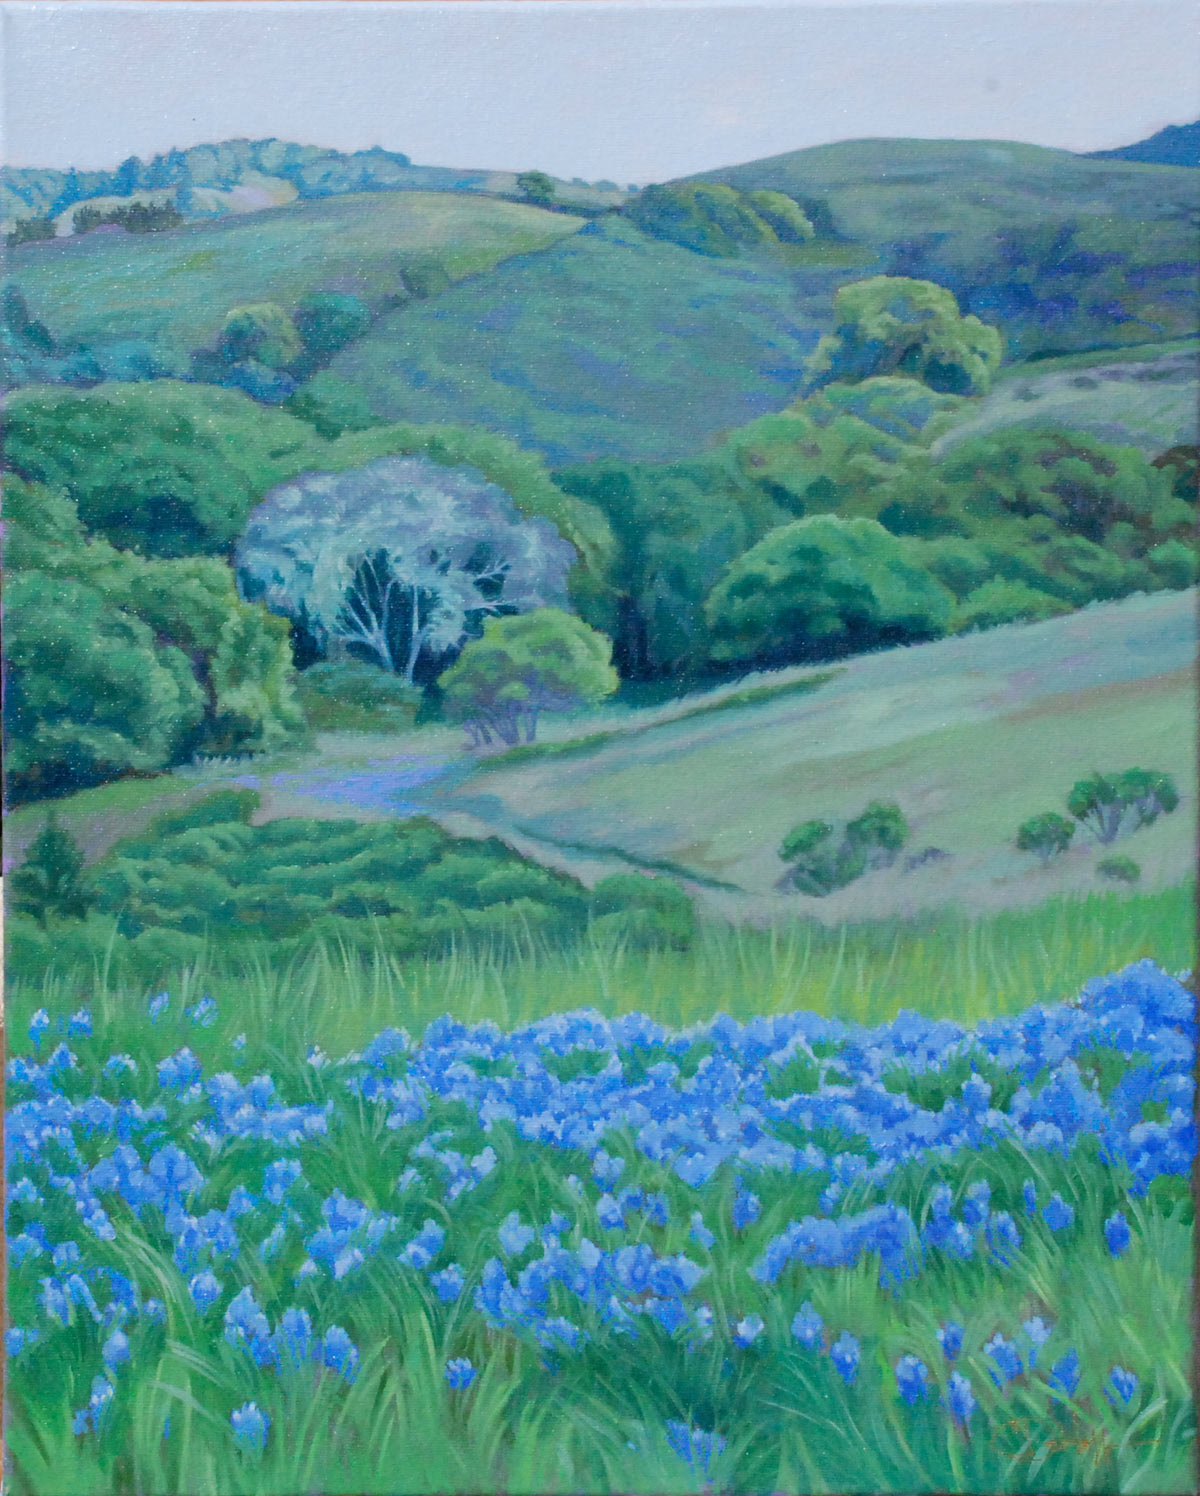 christina-dehoff-carmel-valley-spring